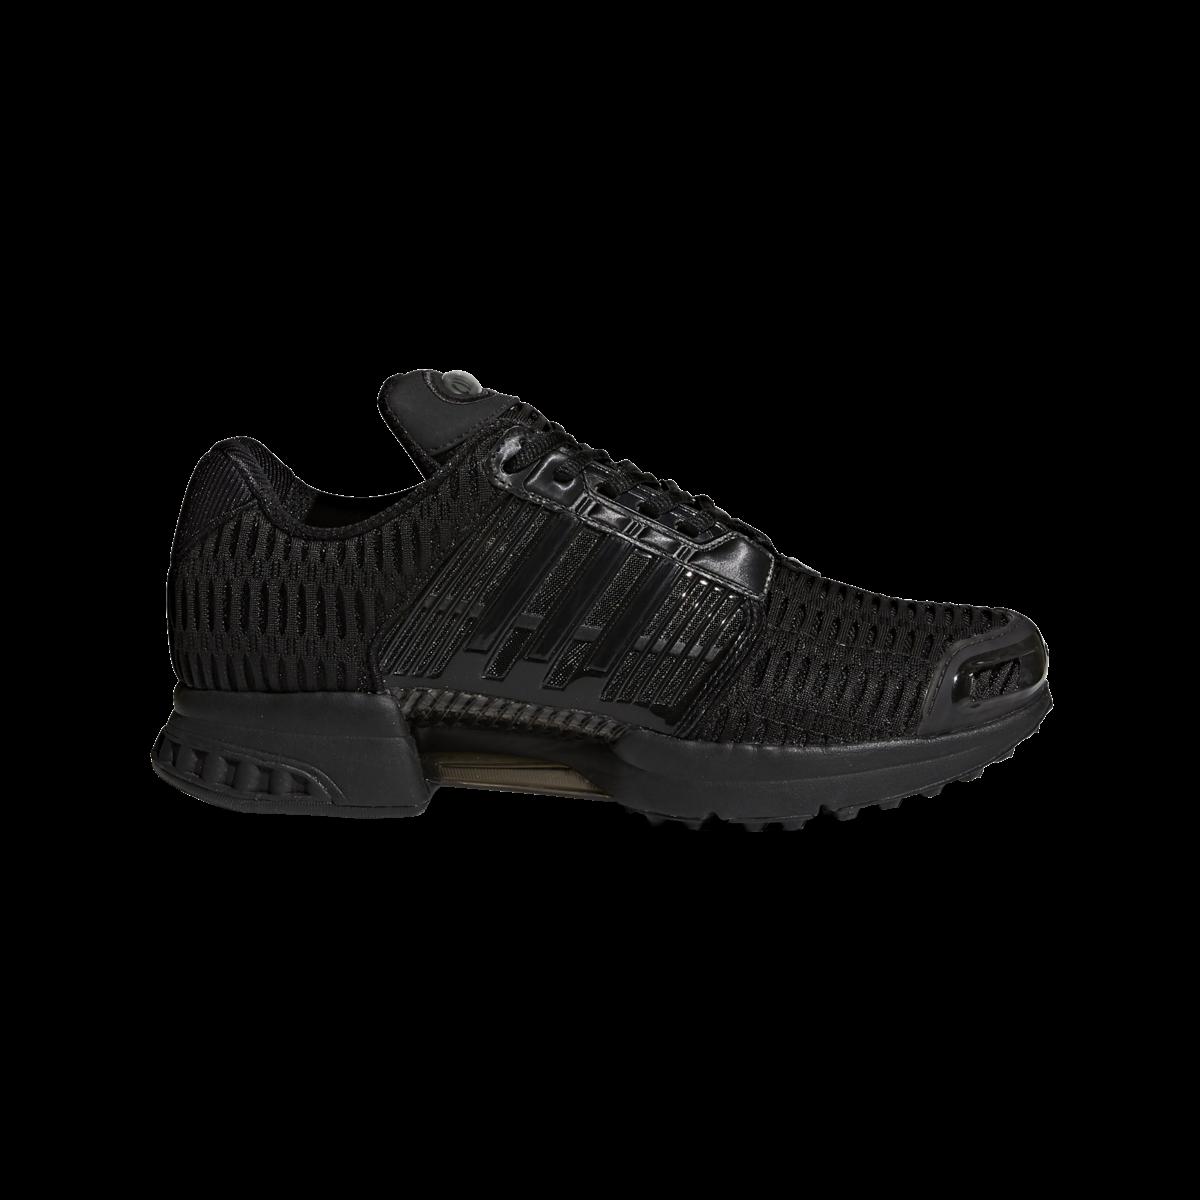 1082b0de70c0 Adidas Climacool 1 Shoes - BA8582